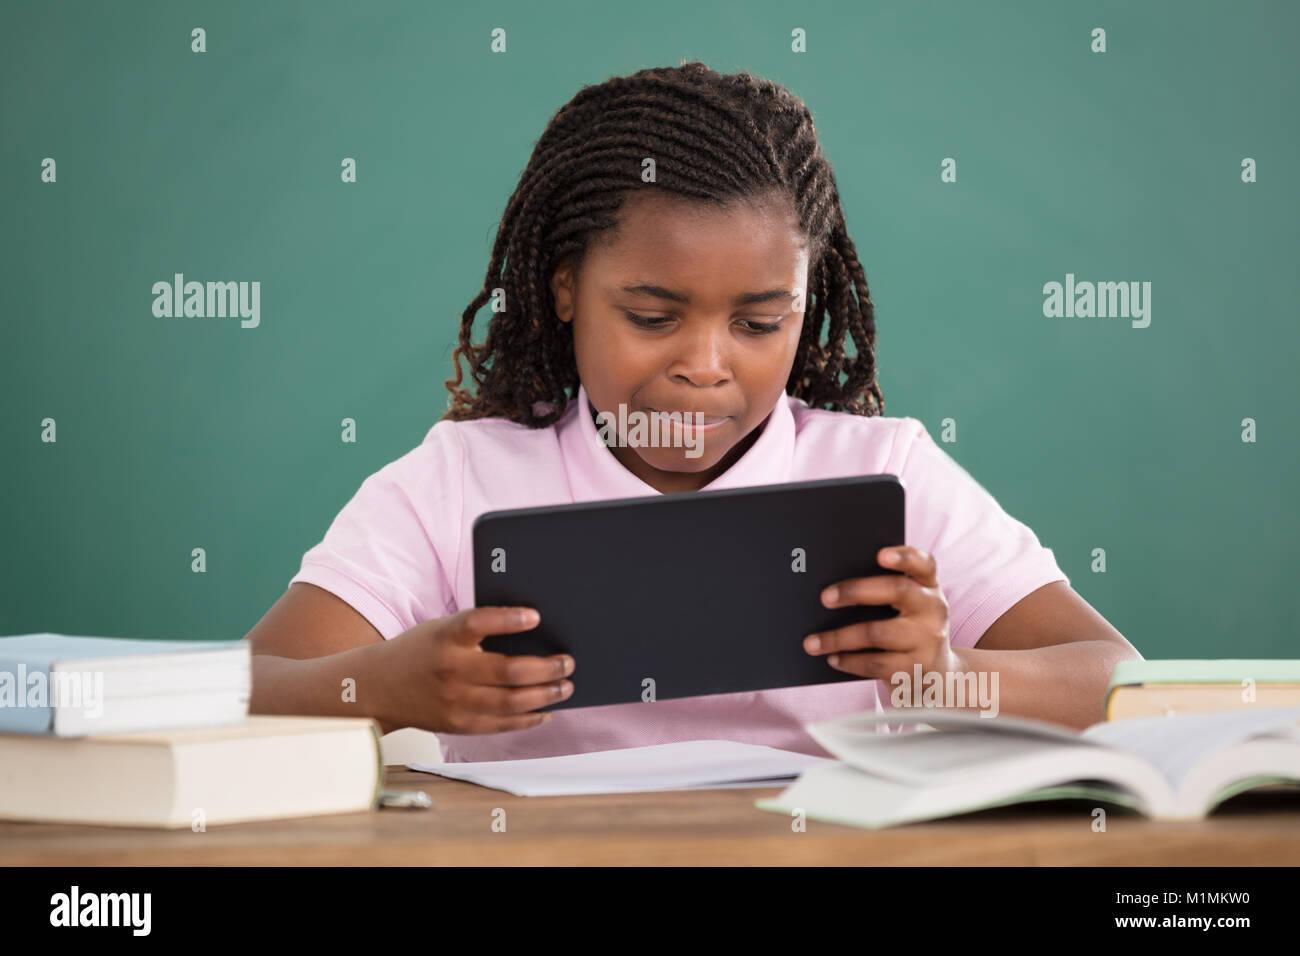 Schoolgirl Using Digital Tablet While Studying Against Chalkboard - Stock Image